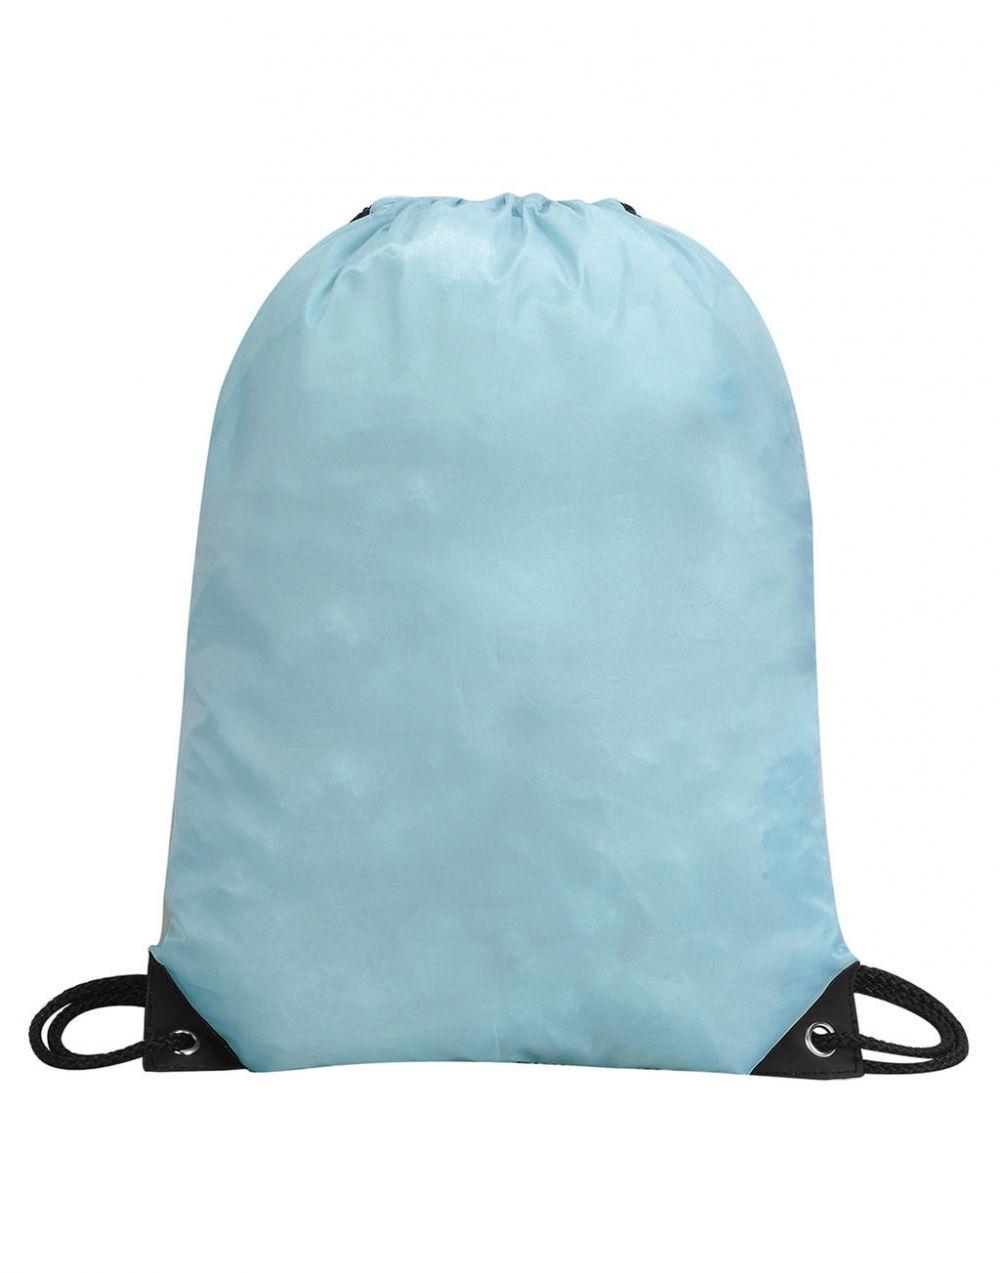 Mochila cuerdas personalizada shugon mochila stafford con logo vista 2